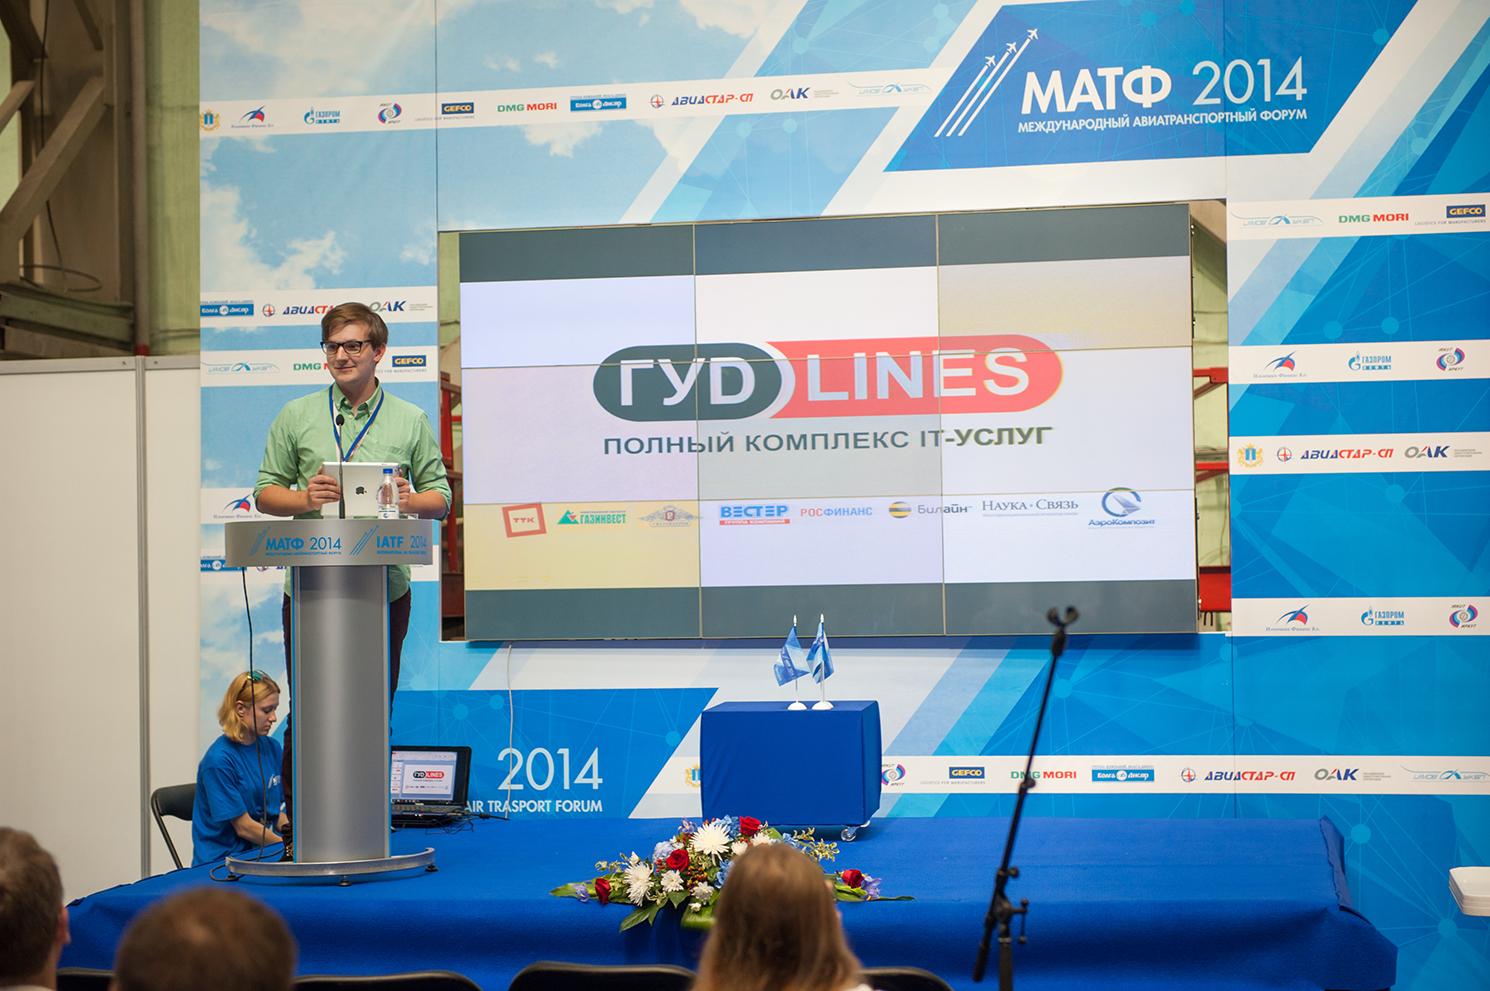 Рогозин, Левитин, Ливанов, Исайкин. Кто из VIPов посетит «МАТФ-2014»?